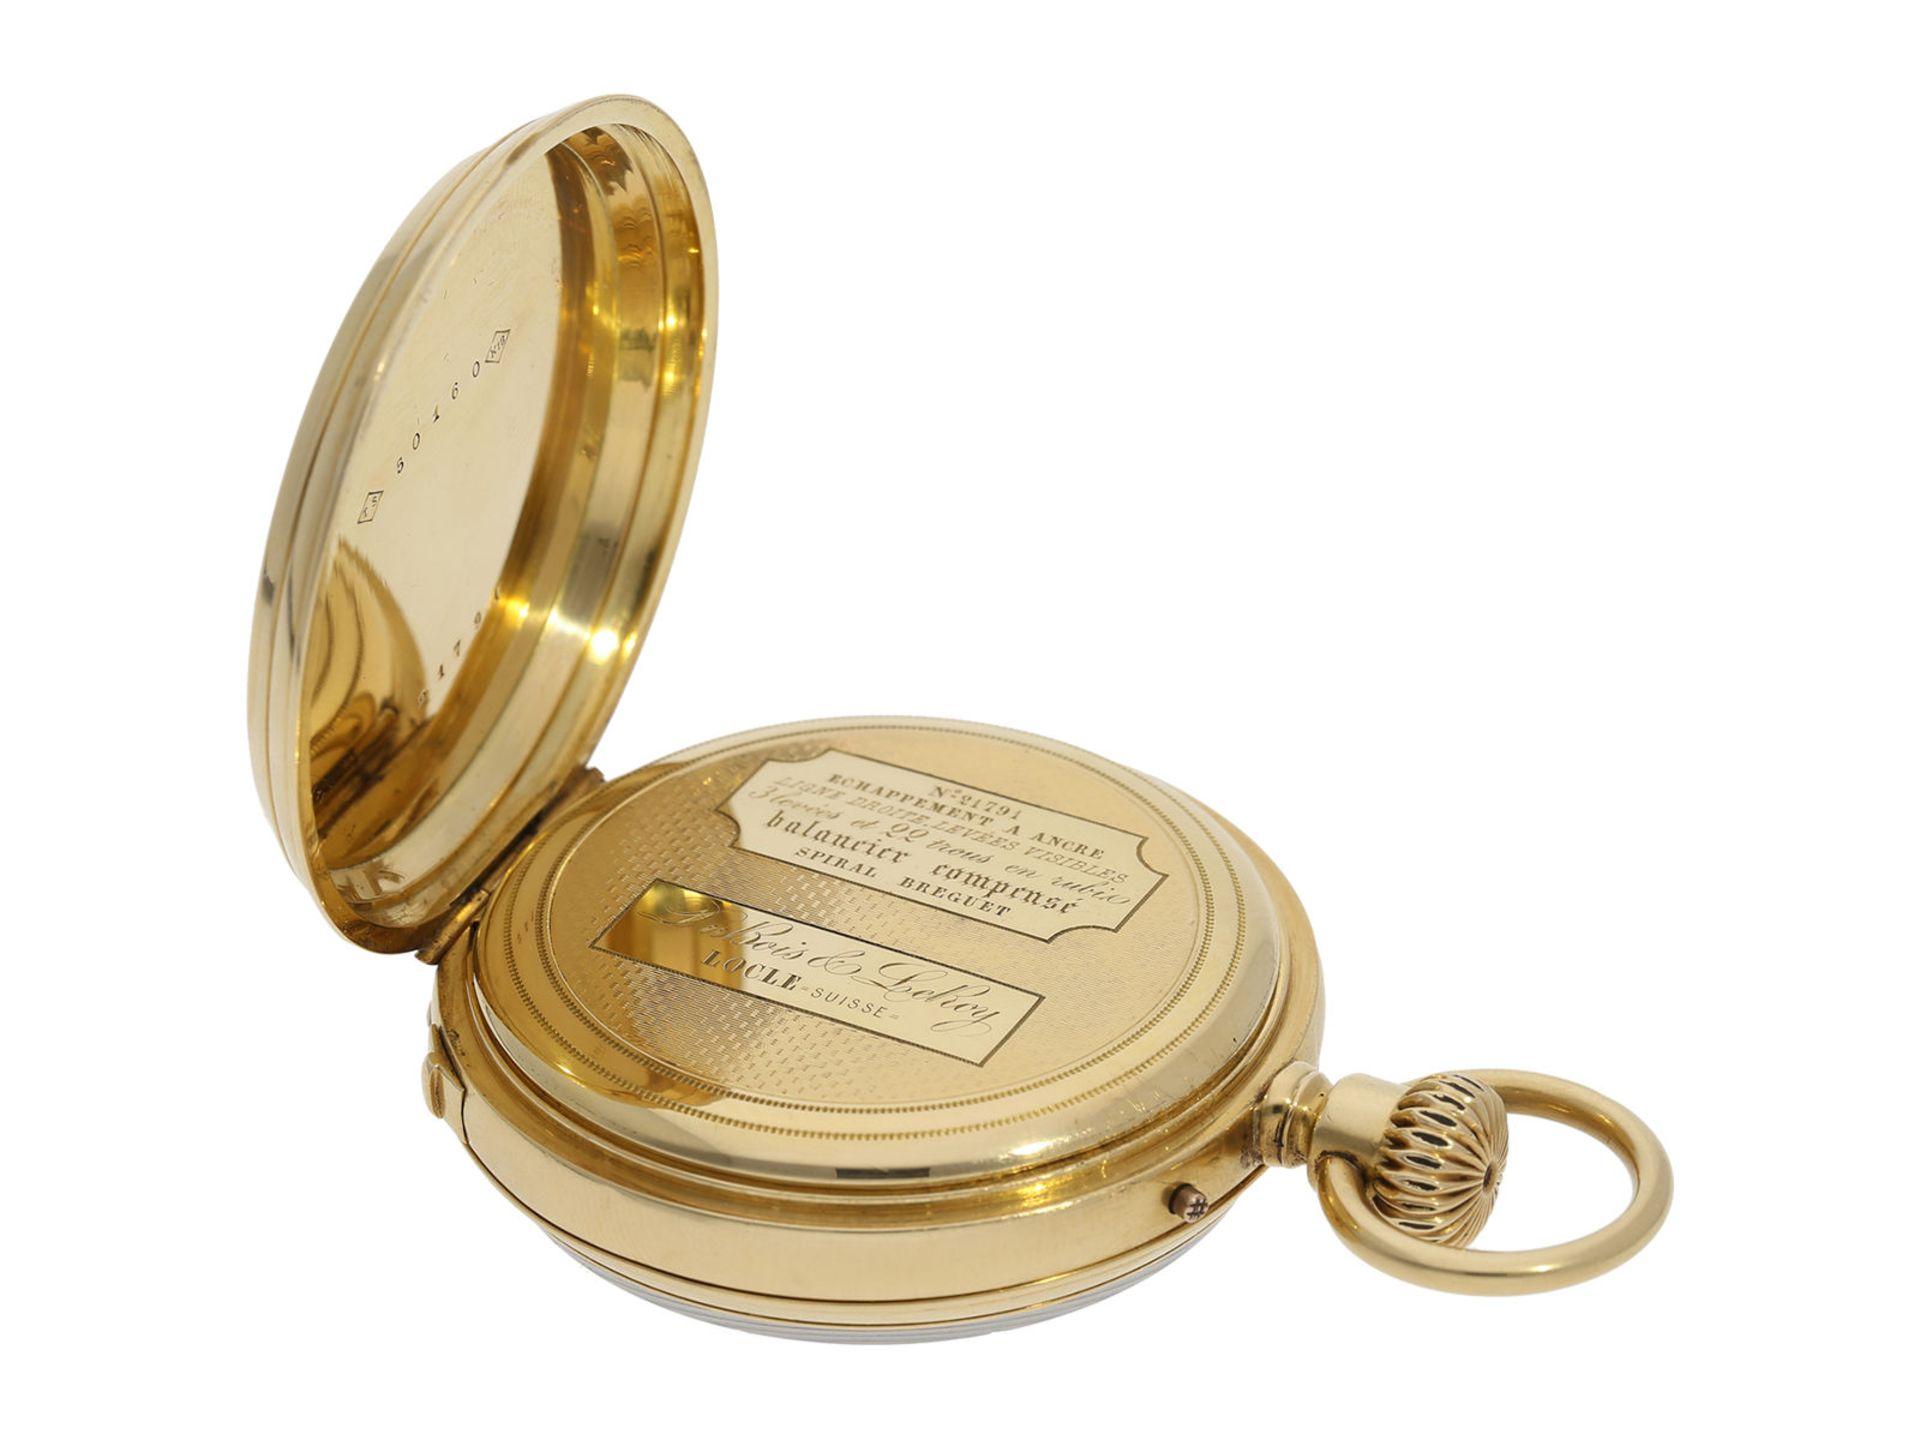 Pocket watch: early precision pocket watch with Seconde Morte, very fine quality, DuBois & LeRoy No. - Bild 5 aus 5